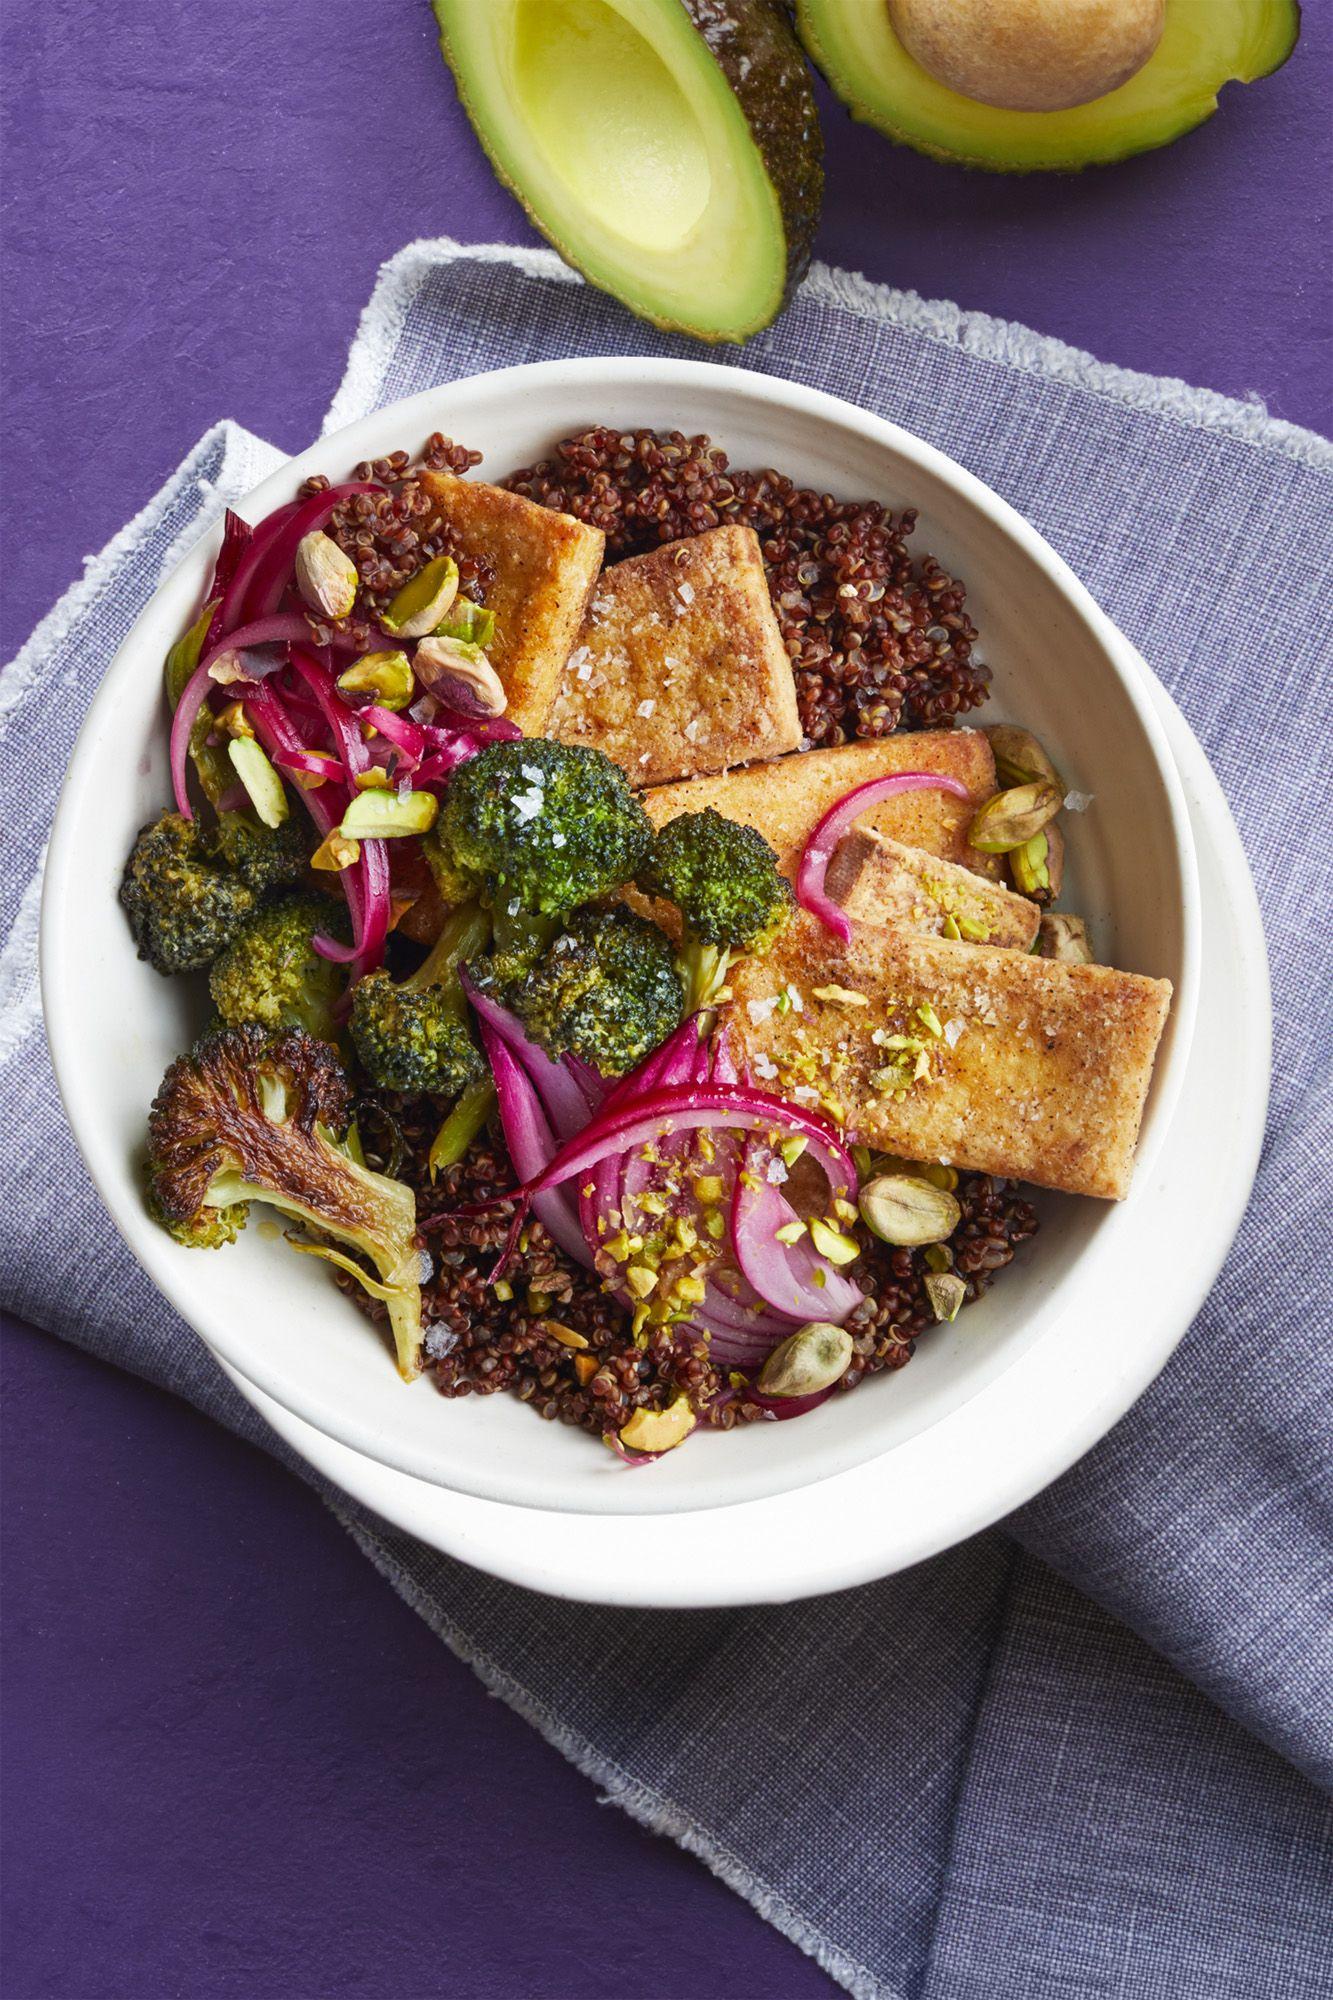 How To Make Tofu Broccoli Bowl Best Tofu Broccoli Bowl Recipe